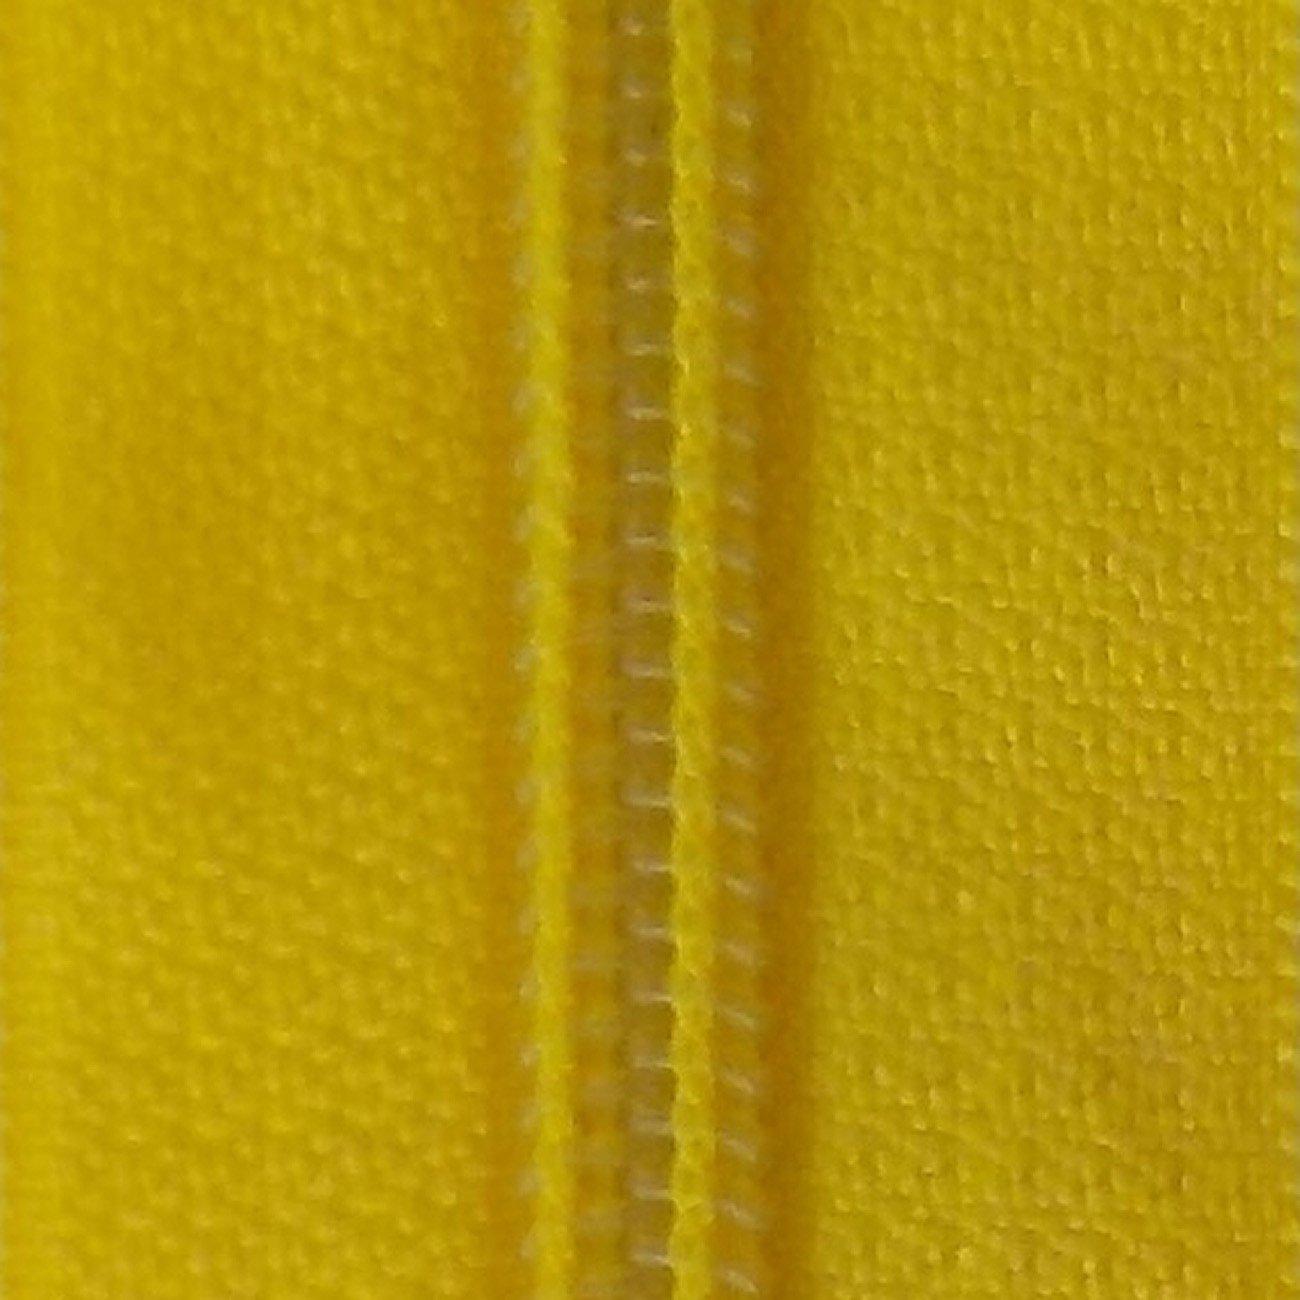 22 Non-separating Zipper Maize